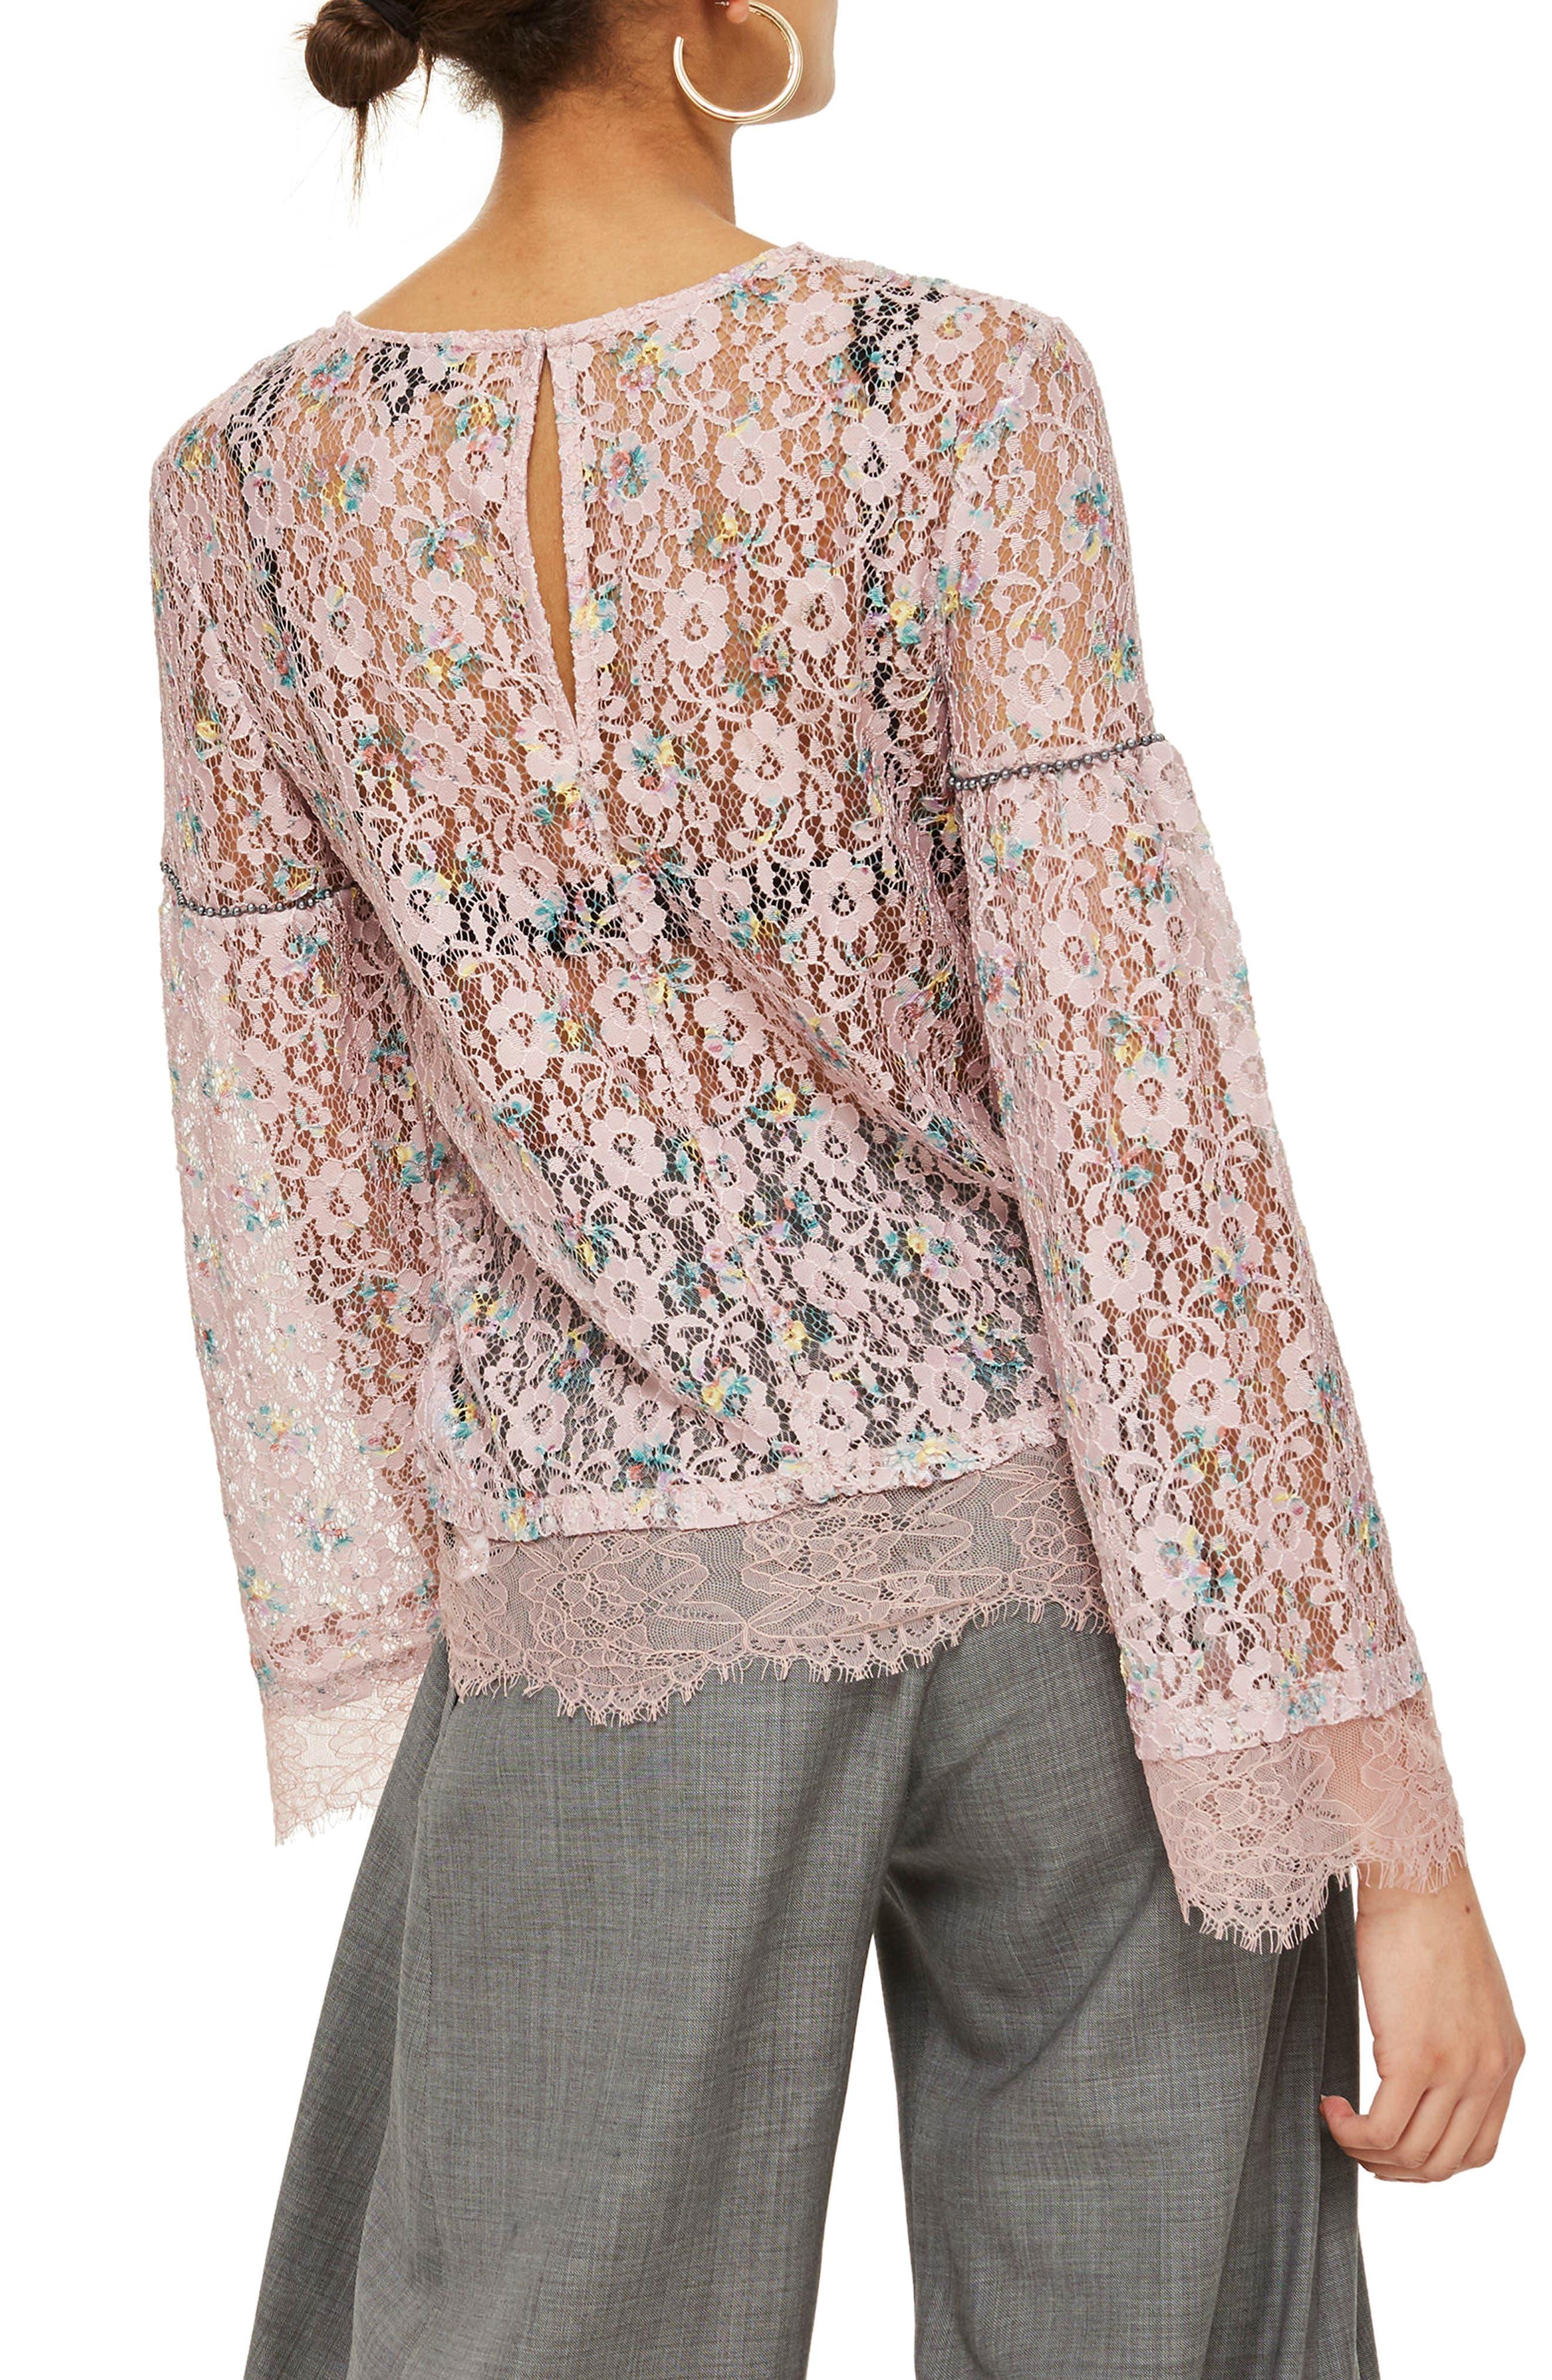 Stud Trim Lace Top,                             Alternate thumbnail 3, color,                             Pink Multi